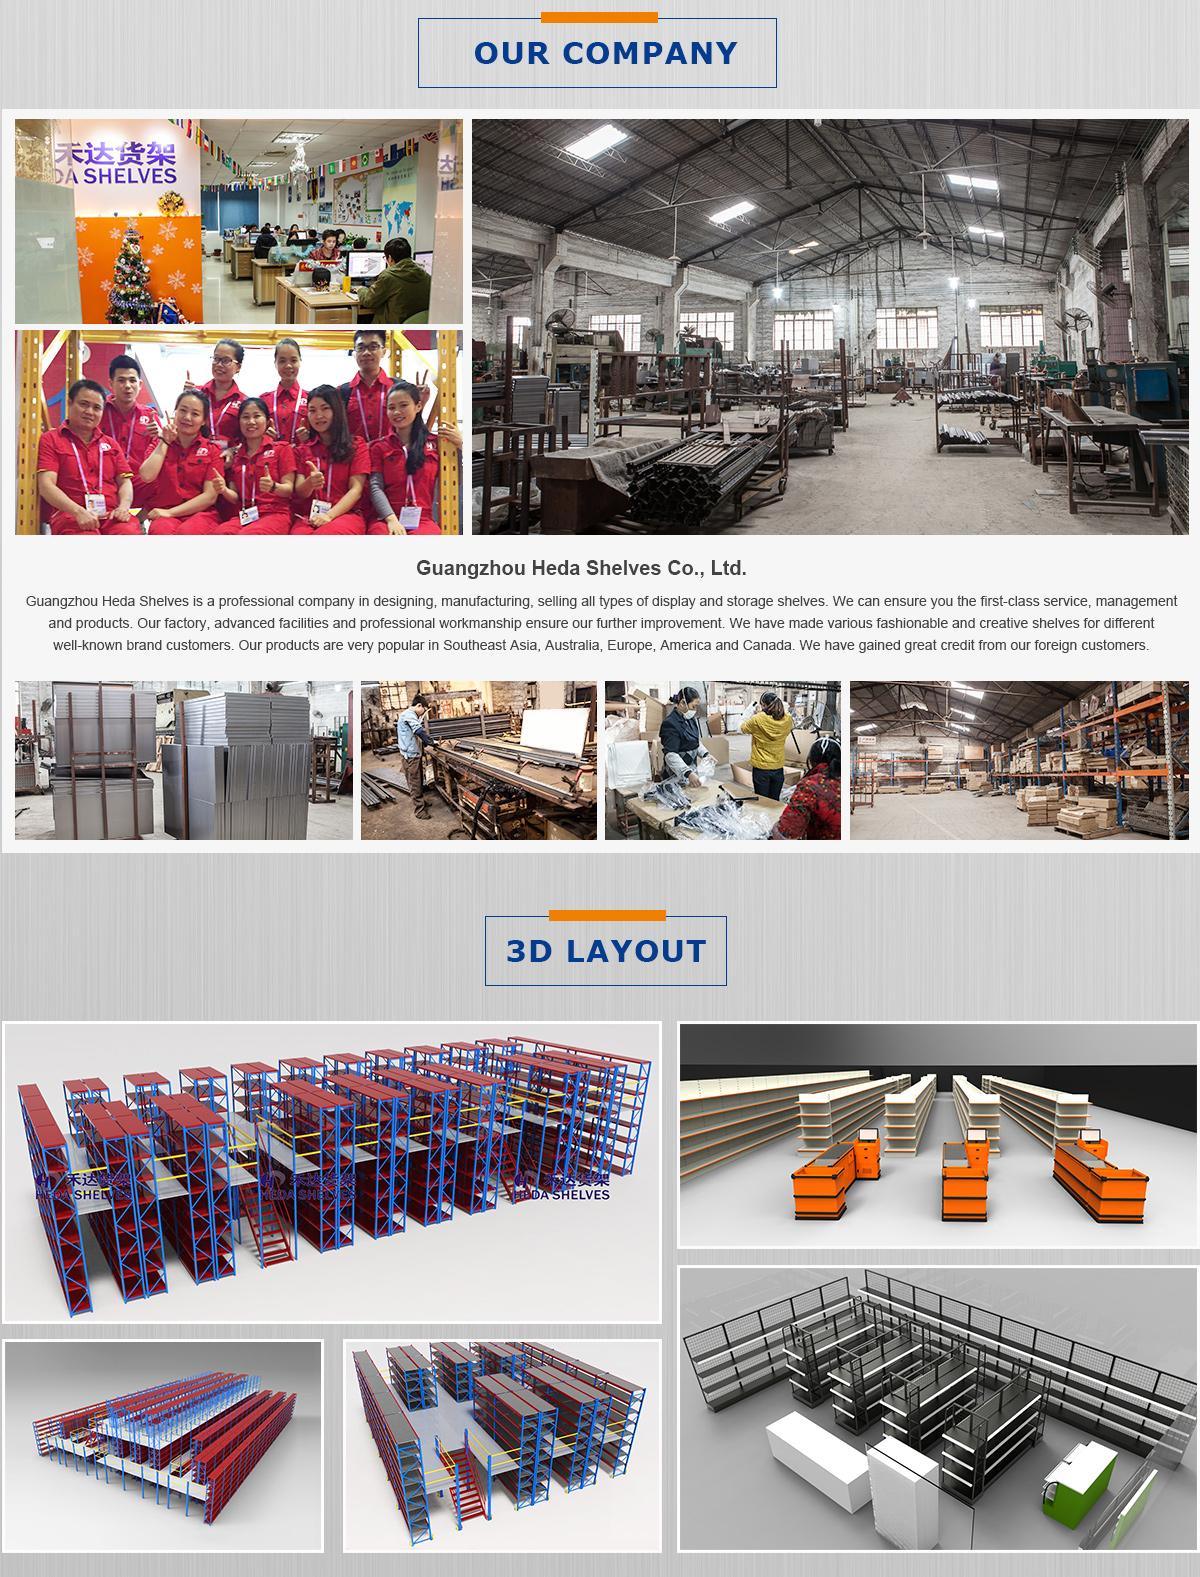 Guangzhou Heda Shelves Co Ltd Shelf Rack # Muebles Sapateras